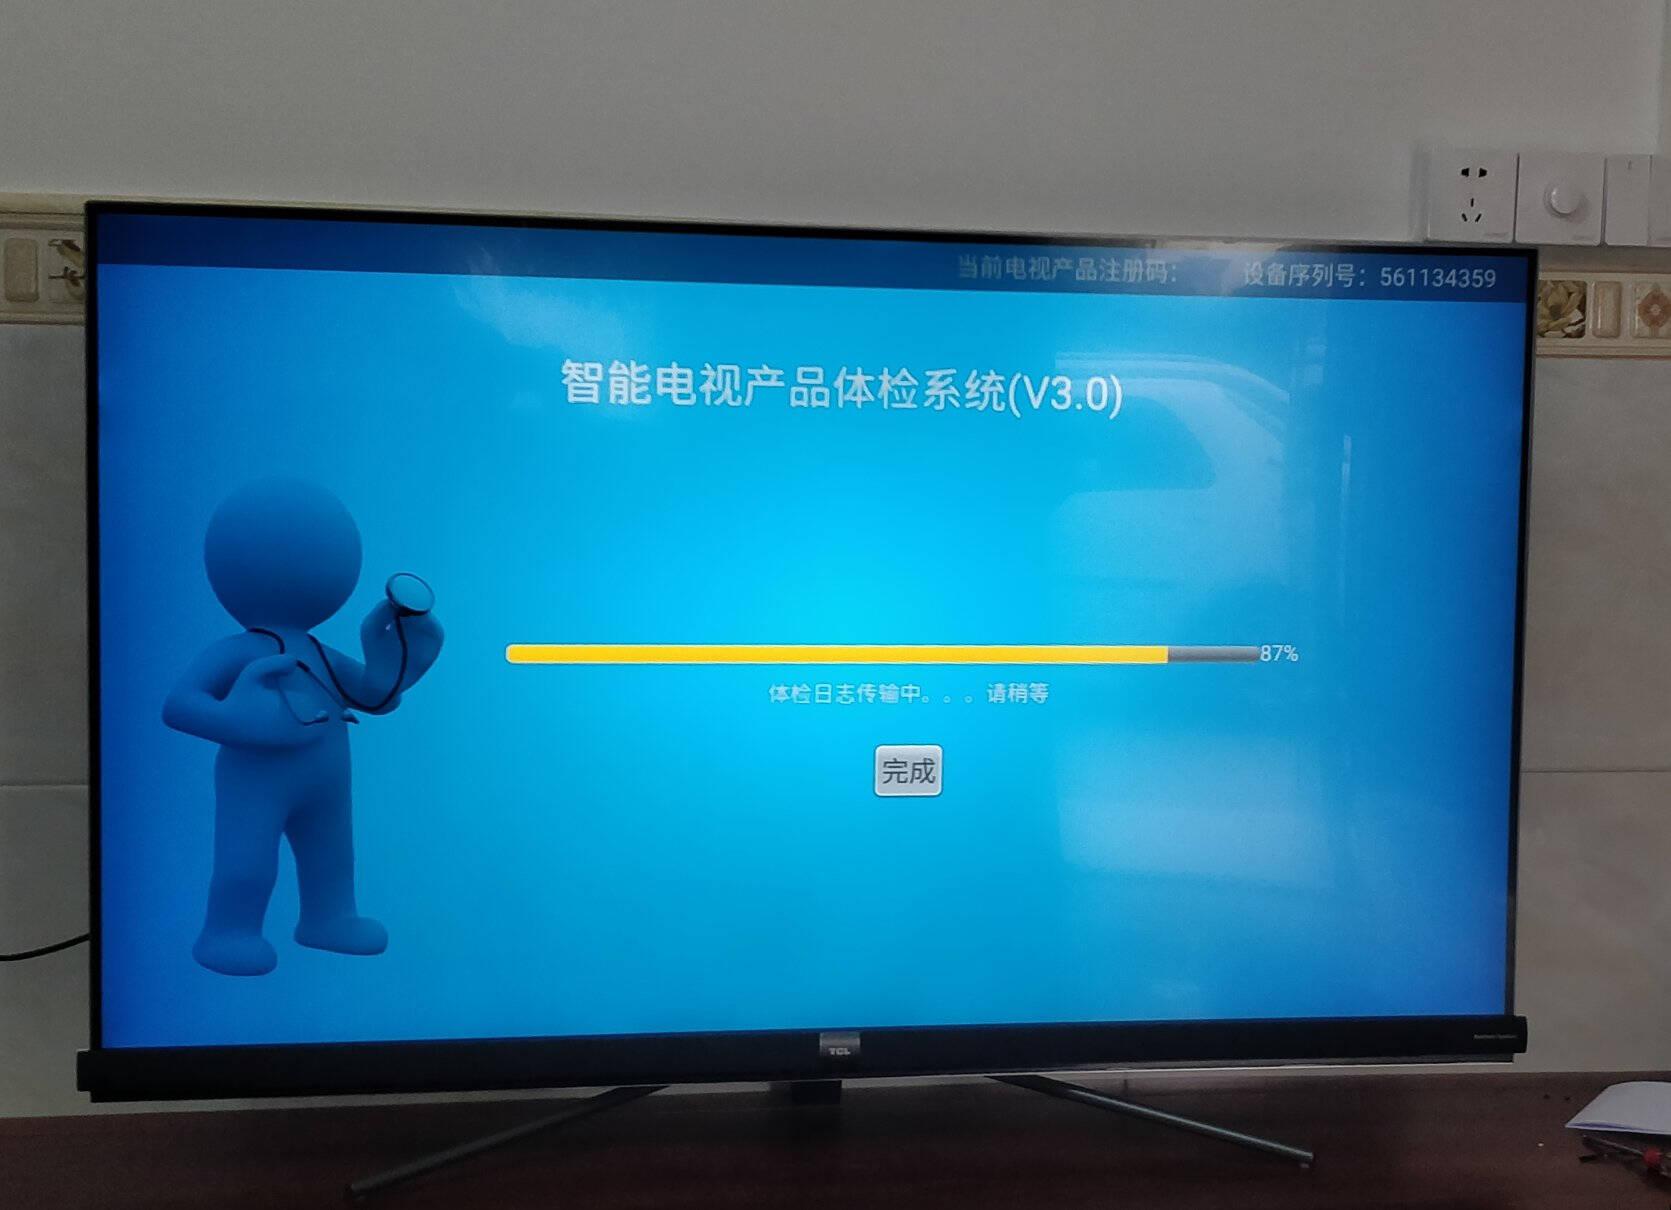 TCL55V8-PRO55英寸130%高色域电视免遥控AI声控智慧屏双通道WiFi2+32GB智能网络液晶平板电视机